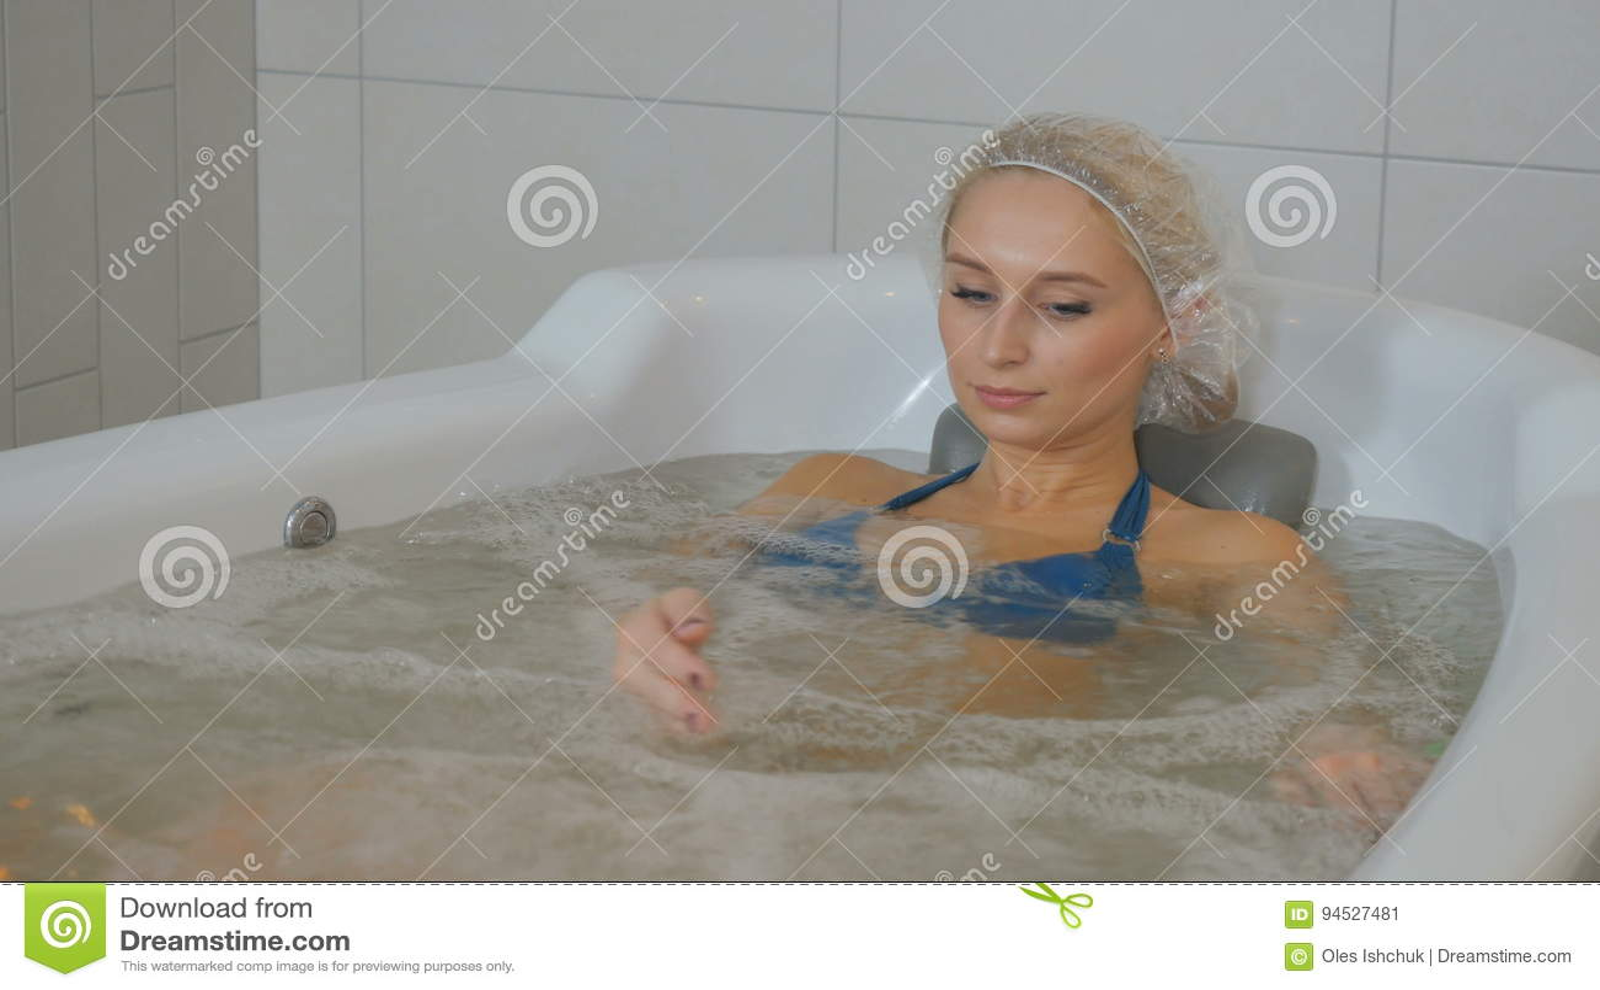 Hot blonde in bathtub